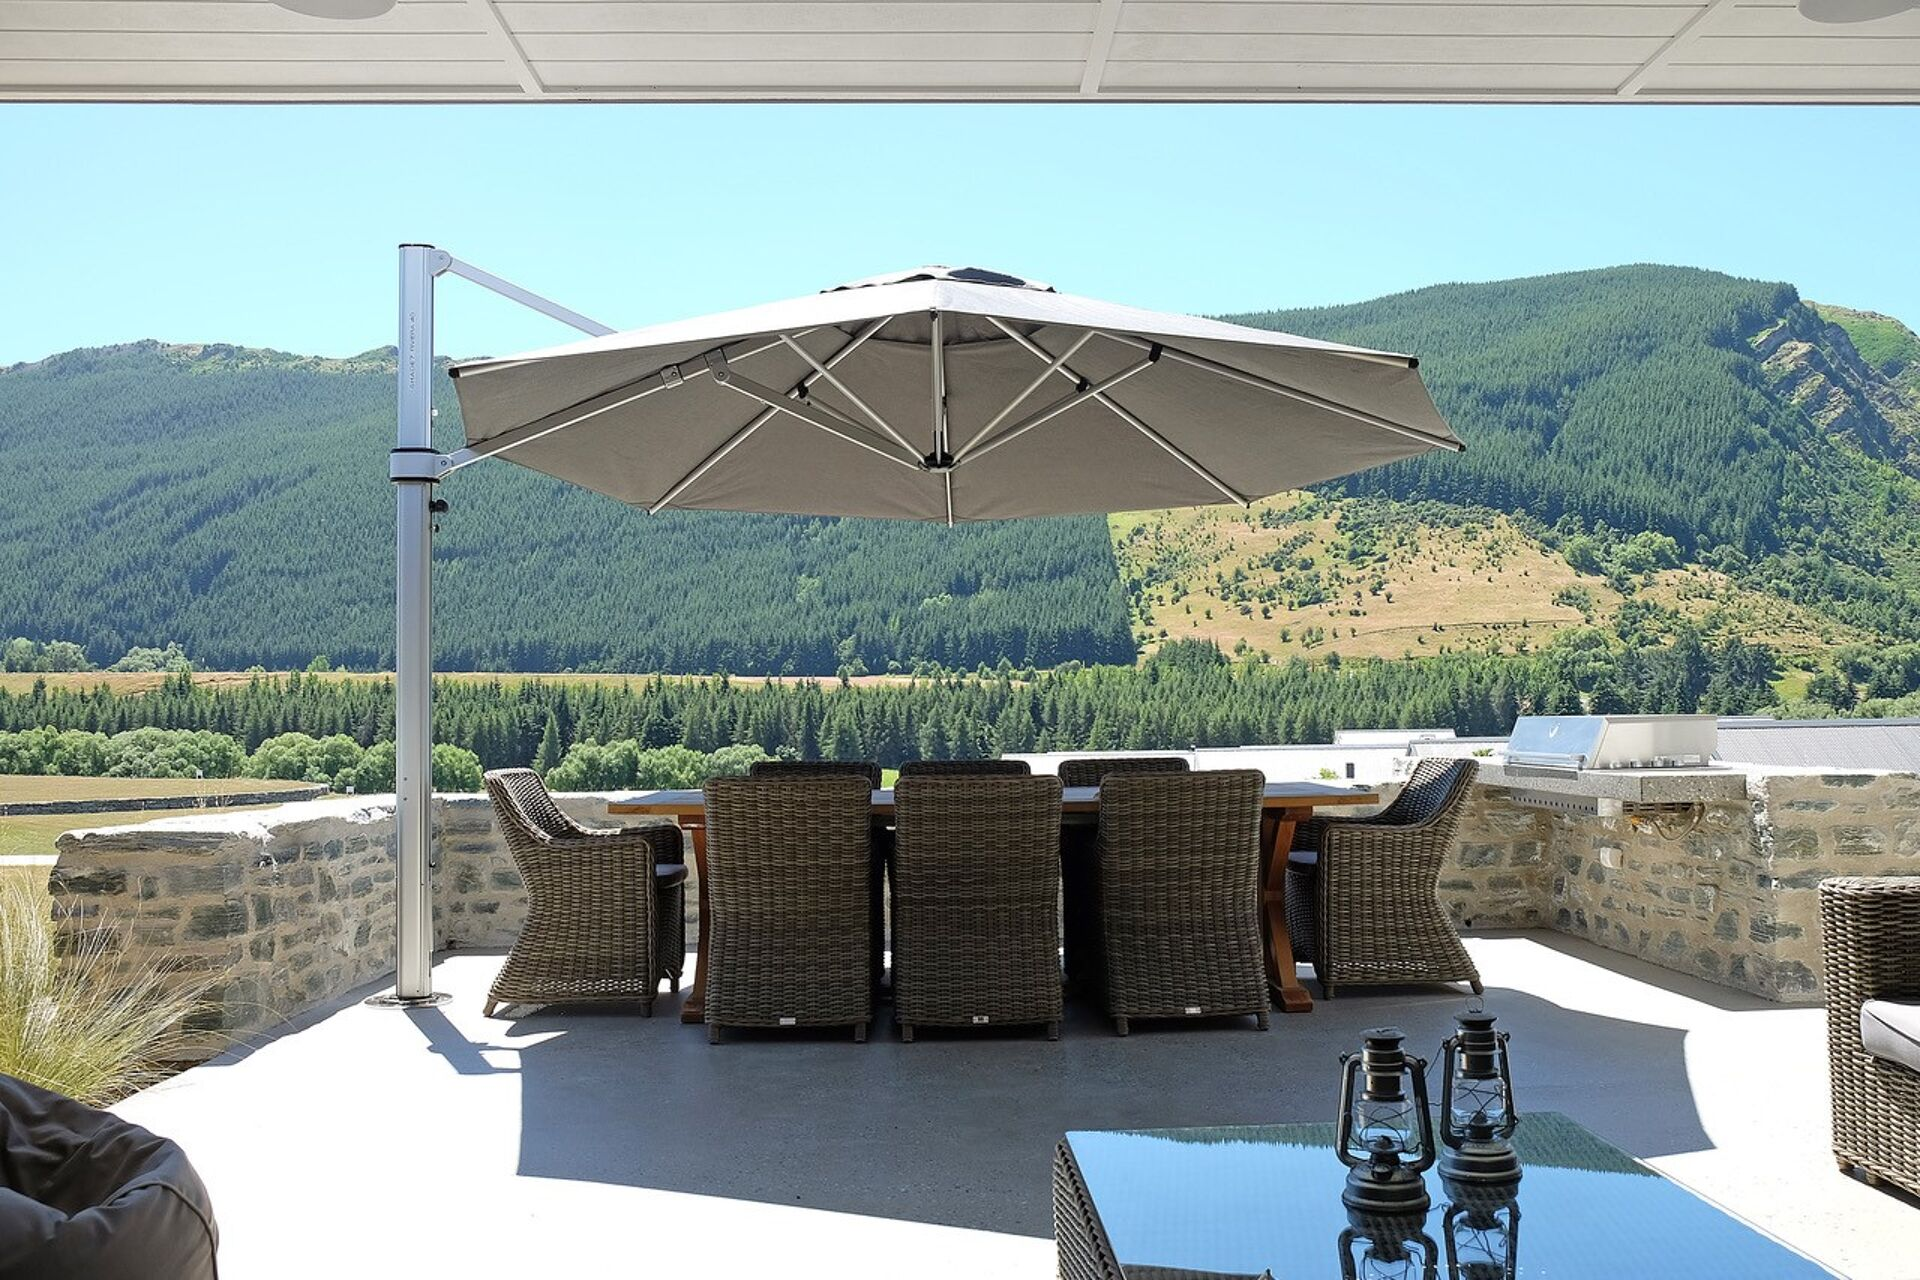 outdoor cantilever umbrellas seen against hills